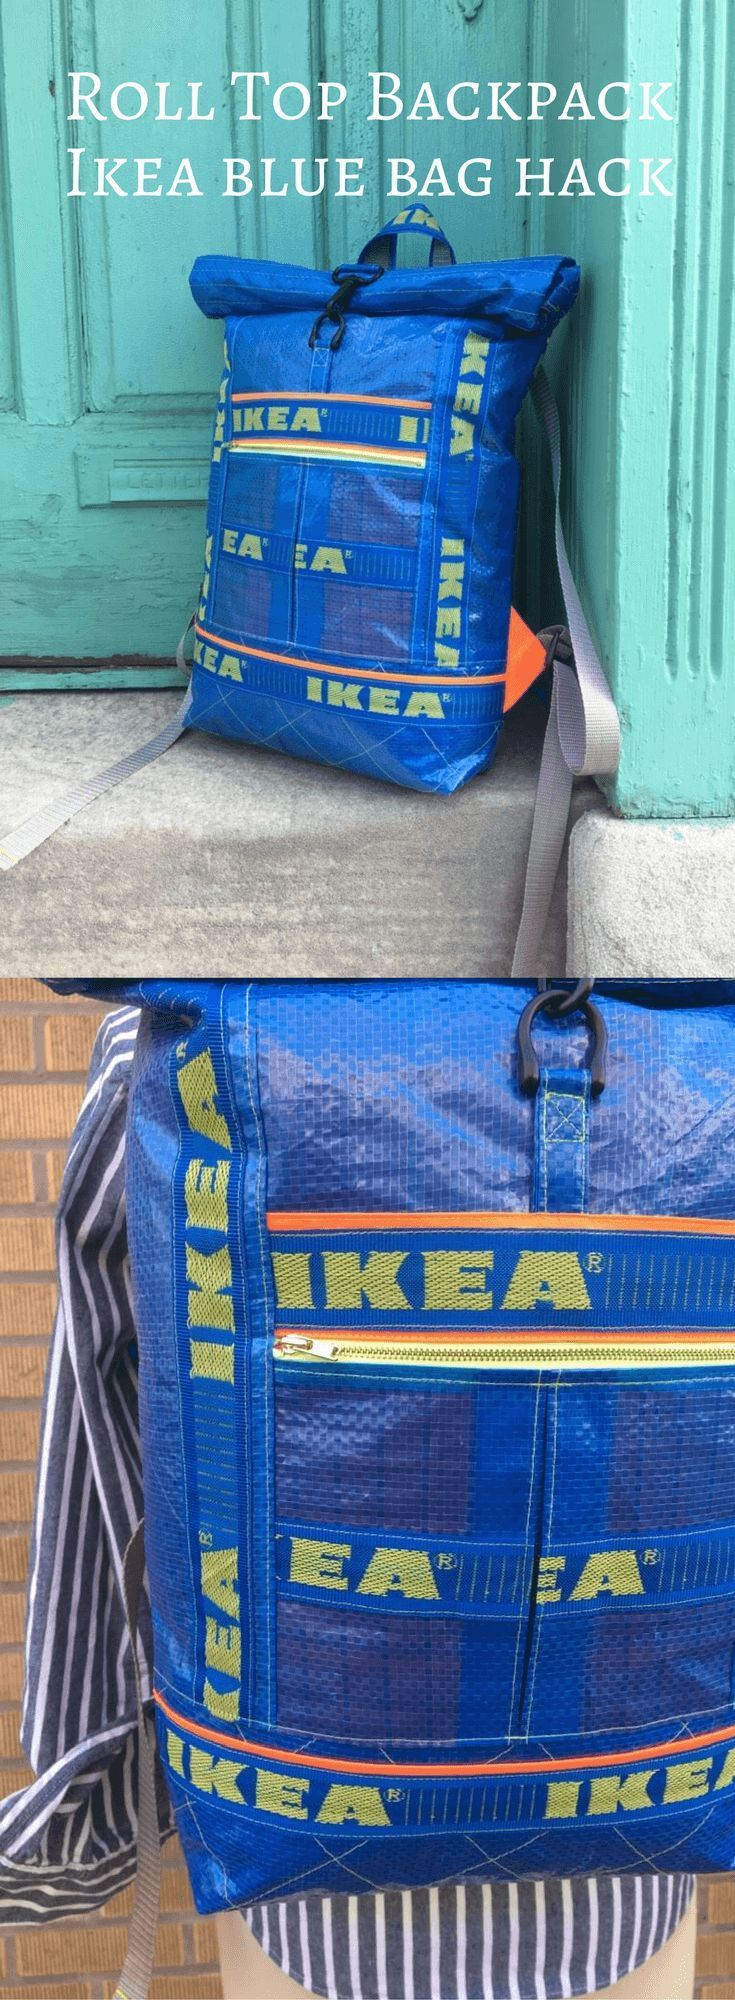 Gut nähen! Ein Roll-Top-Rucksack von IKEA Blue Bags www.ikeahackers.n